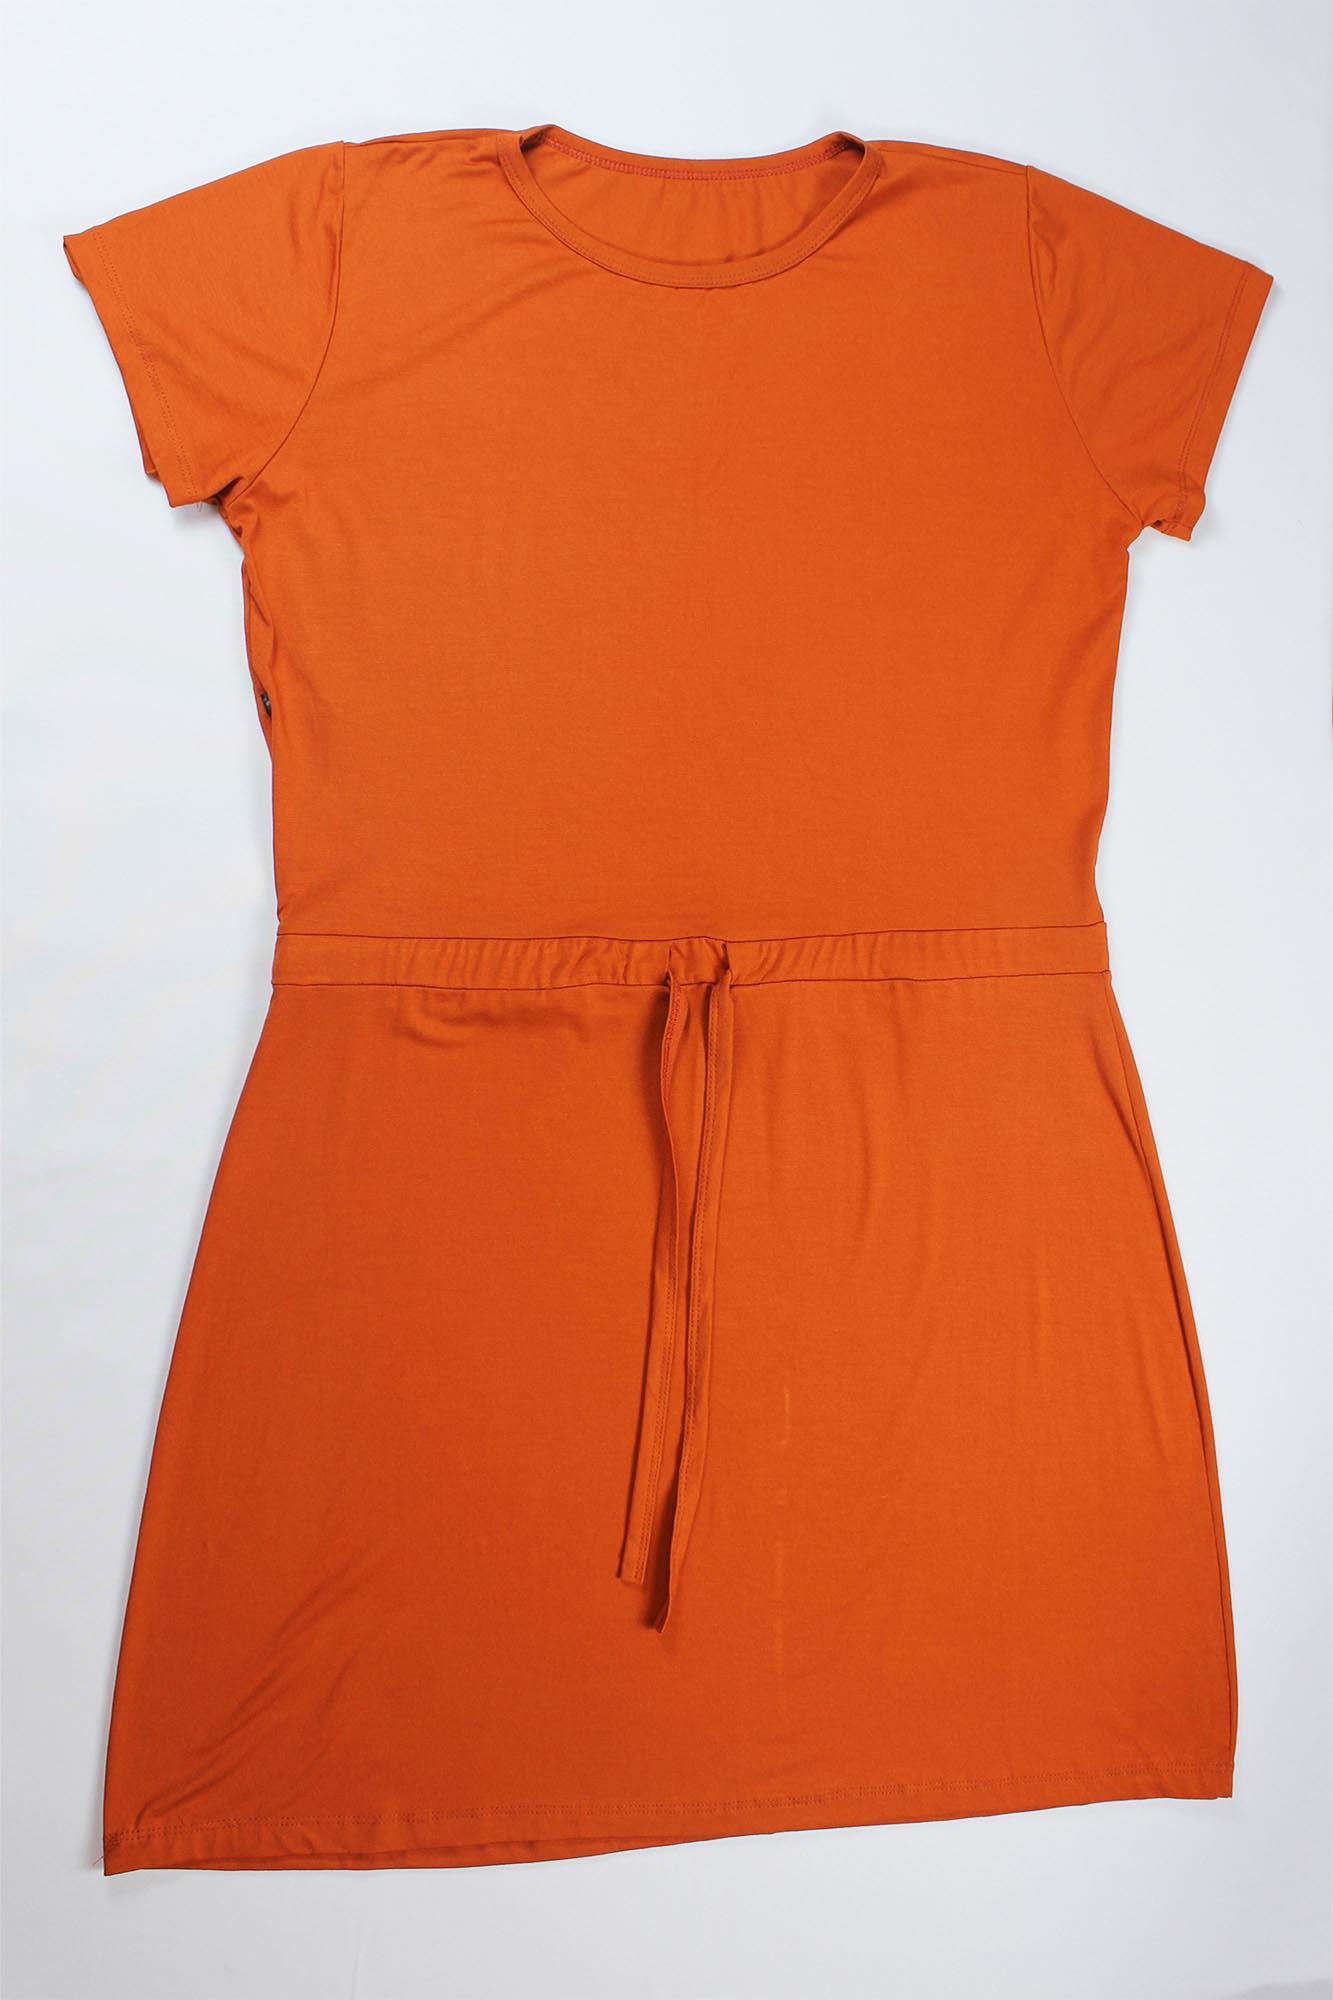 Vestido Curto de Amarrar Feminino - Terracota